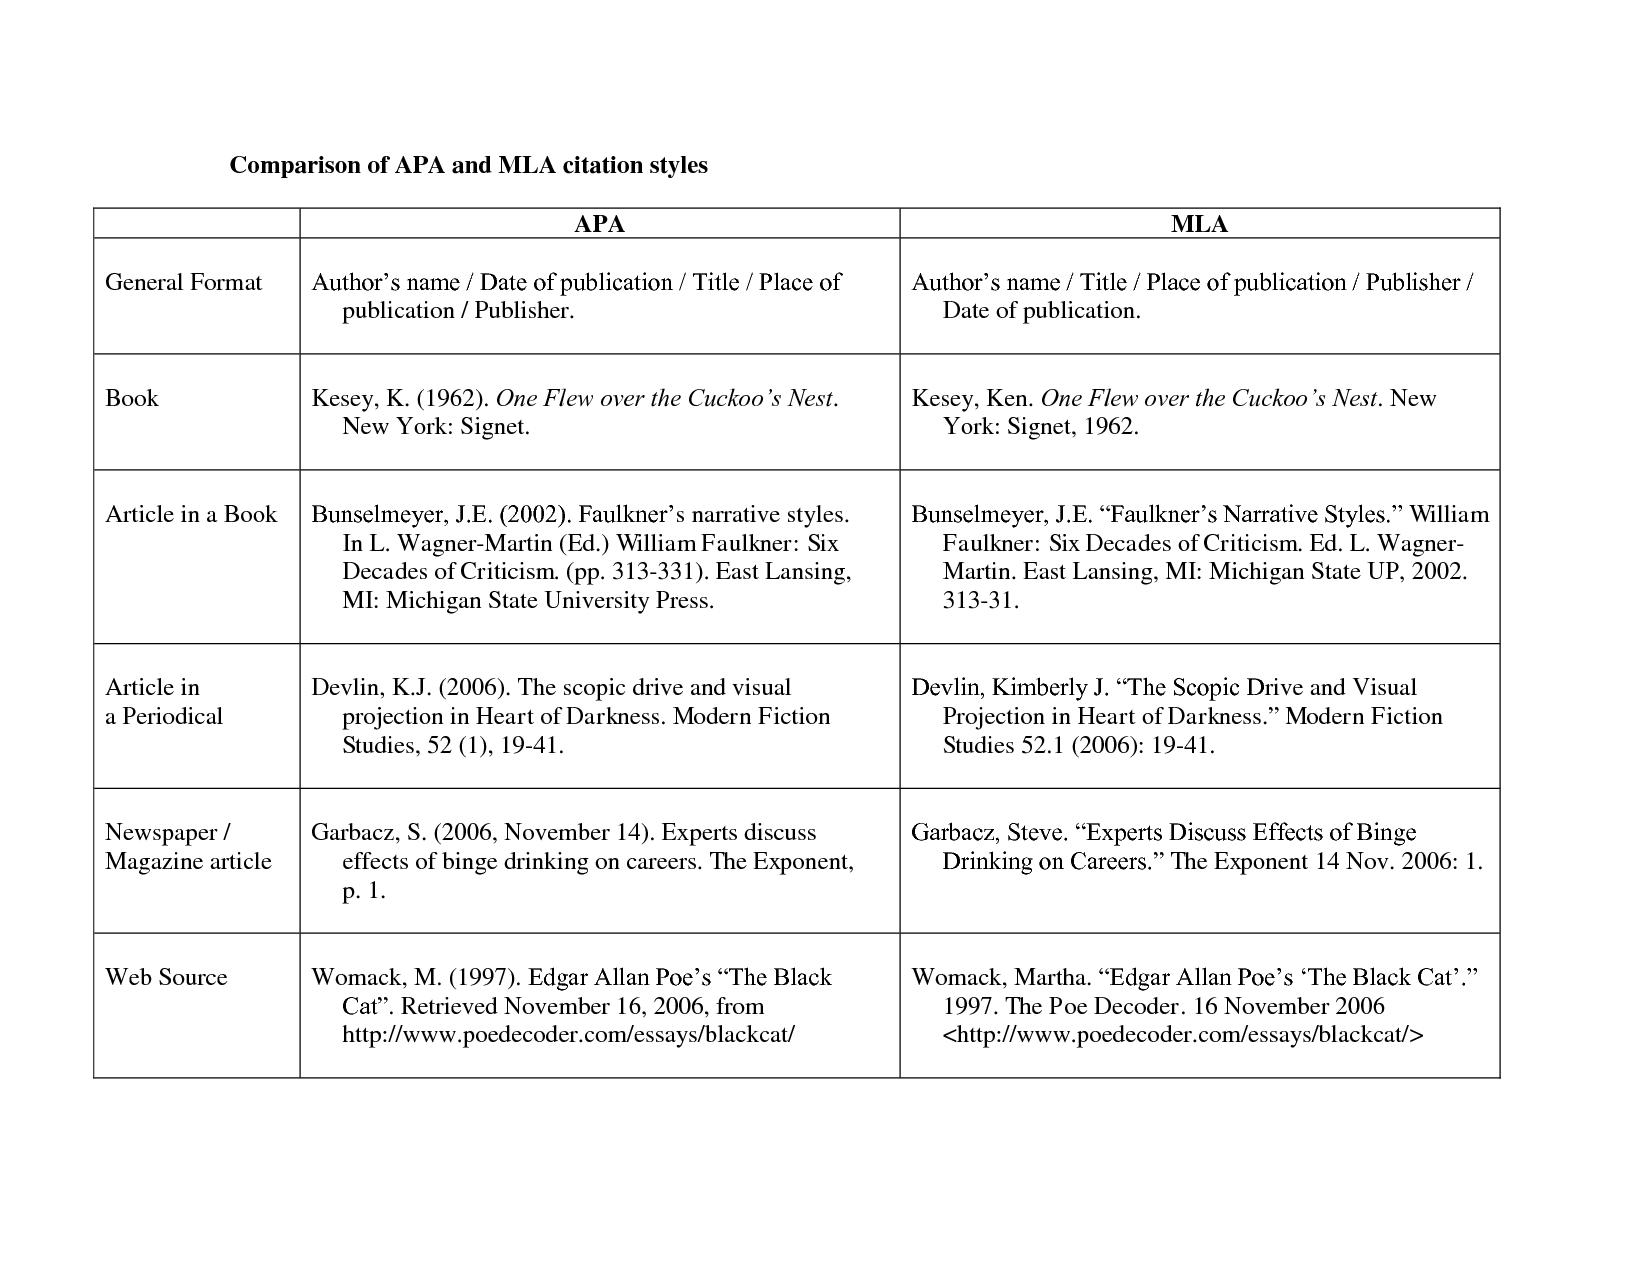 mla citation template comparison of apa and mla citation styles